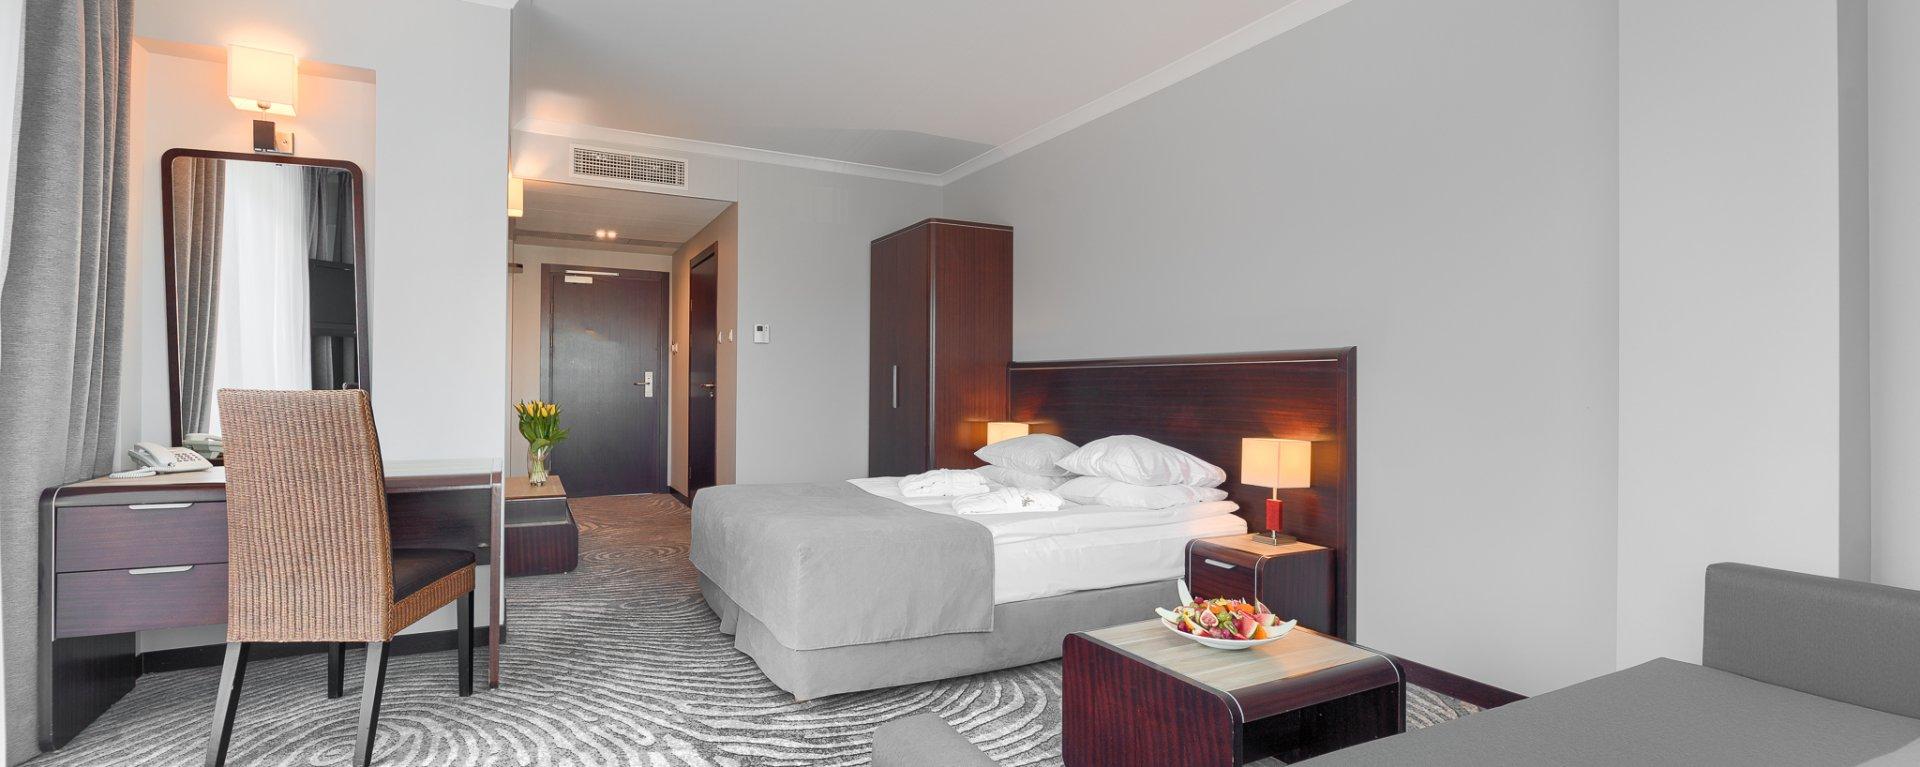 Luxe-Doppelzimmer